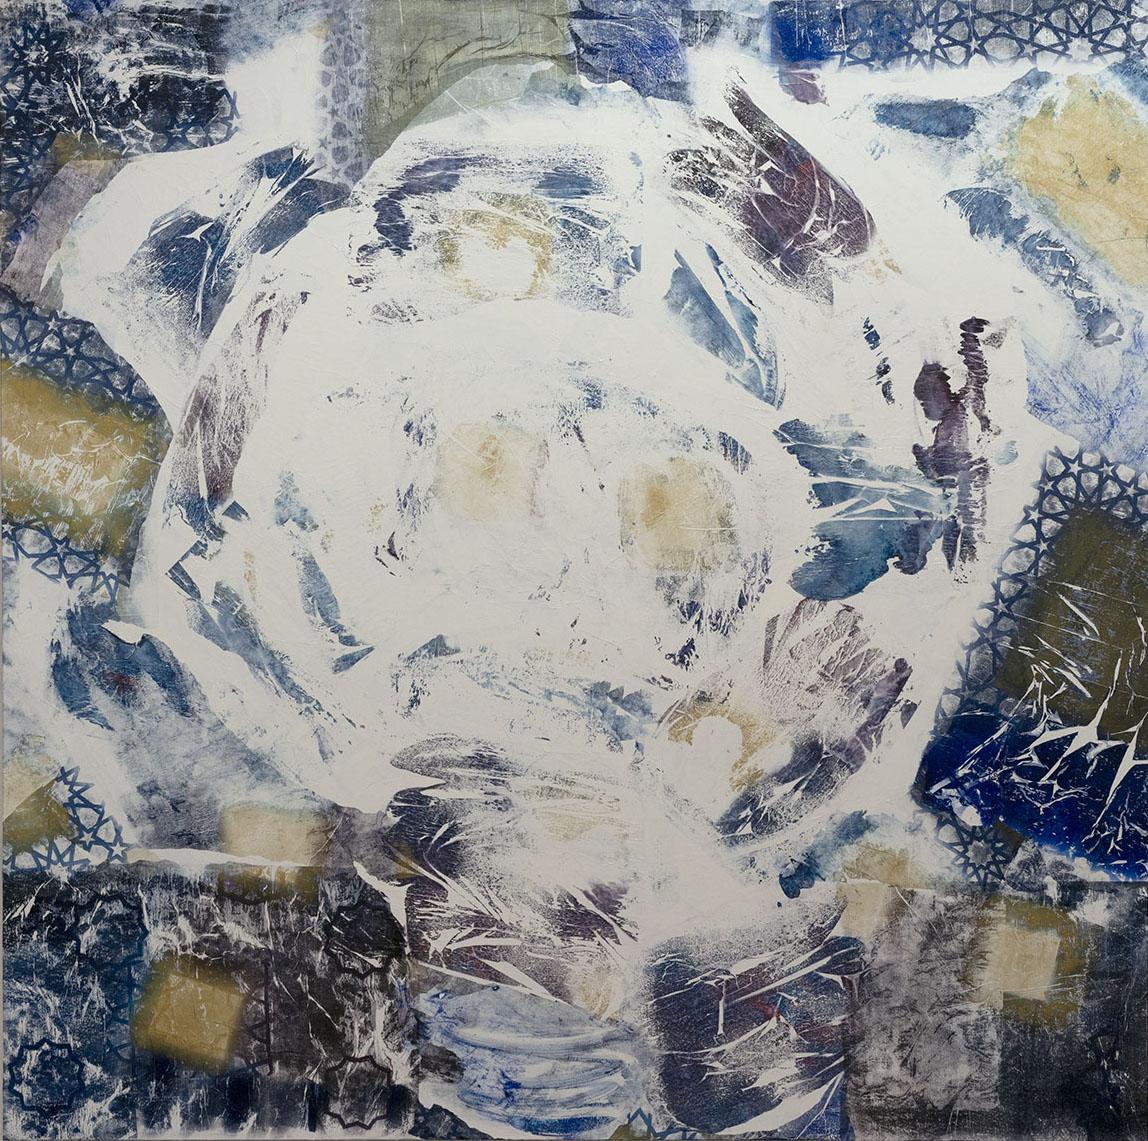 Jessica Watson-Thorp_Athiri (Ethereal)_2018_Mono prints on acid free tissue glazed onto canvas_200 x 200 cm47.jpg